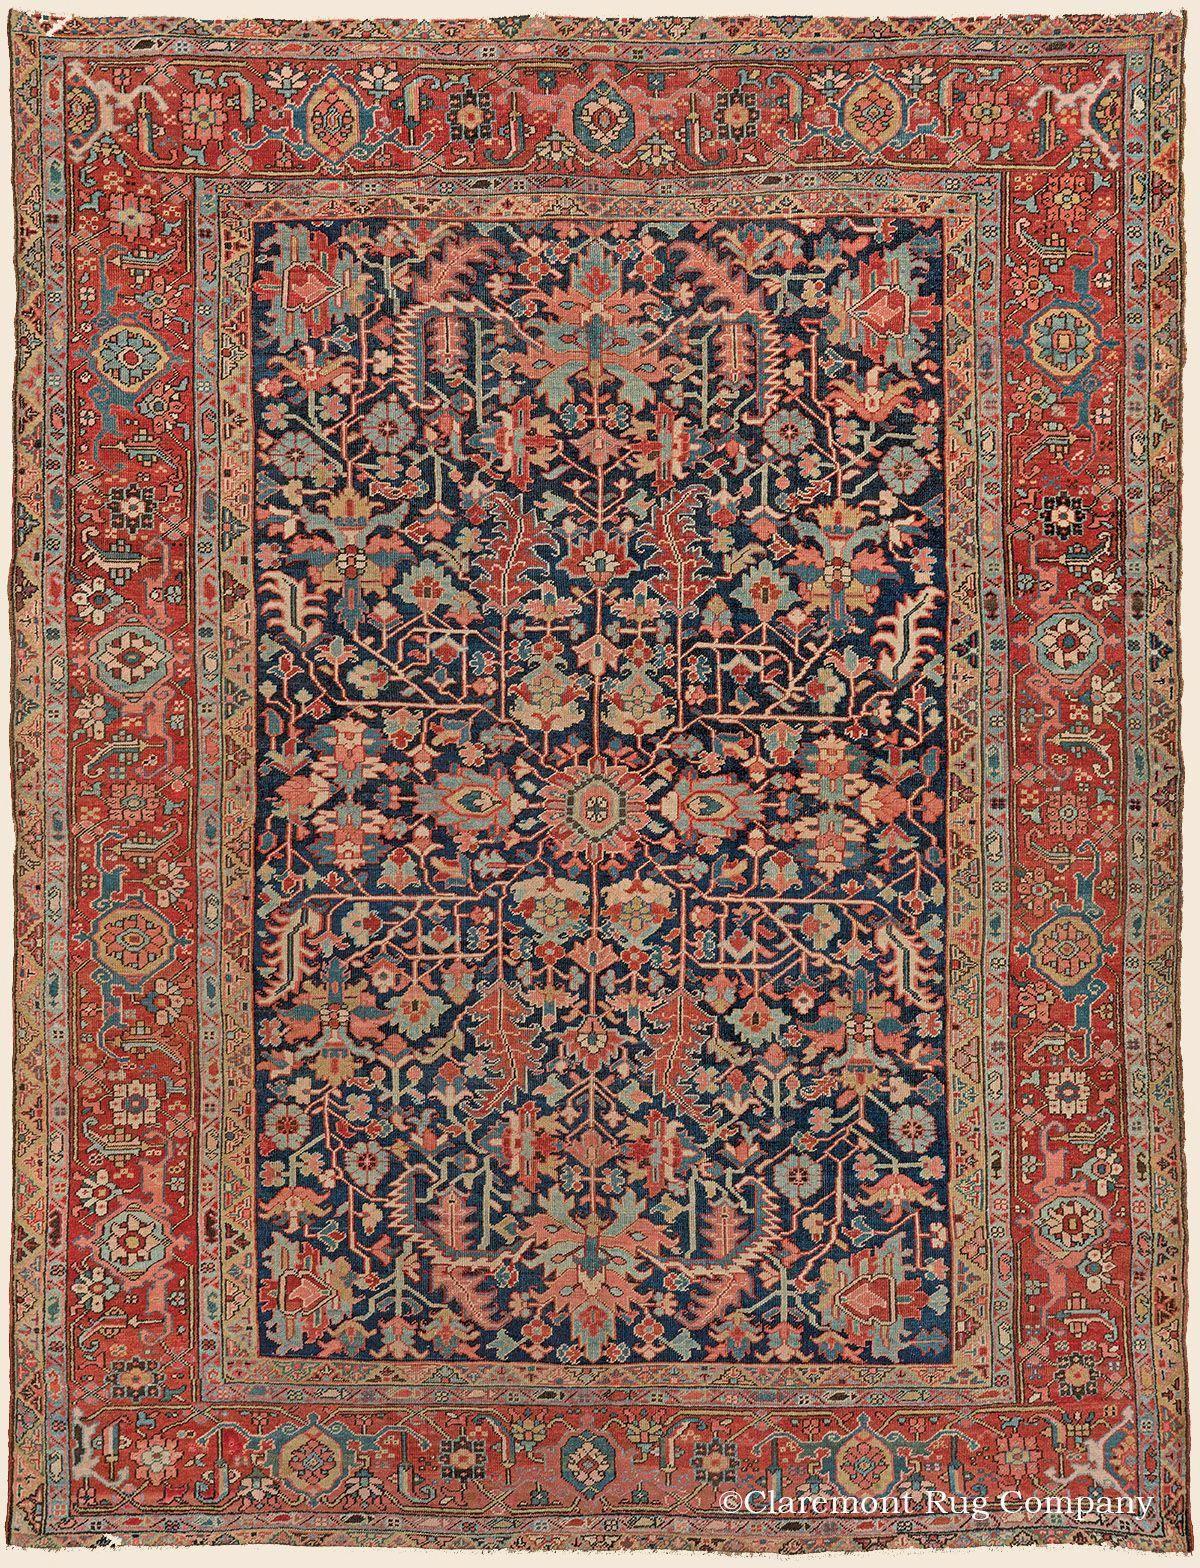 Carpet Runners Northern Ireland Carpetrunnersnortheast Code 1194970066 Rugs On Carpet Persian Carpet Rugs In Living Room